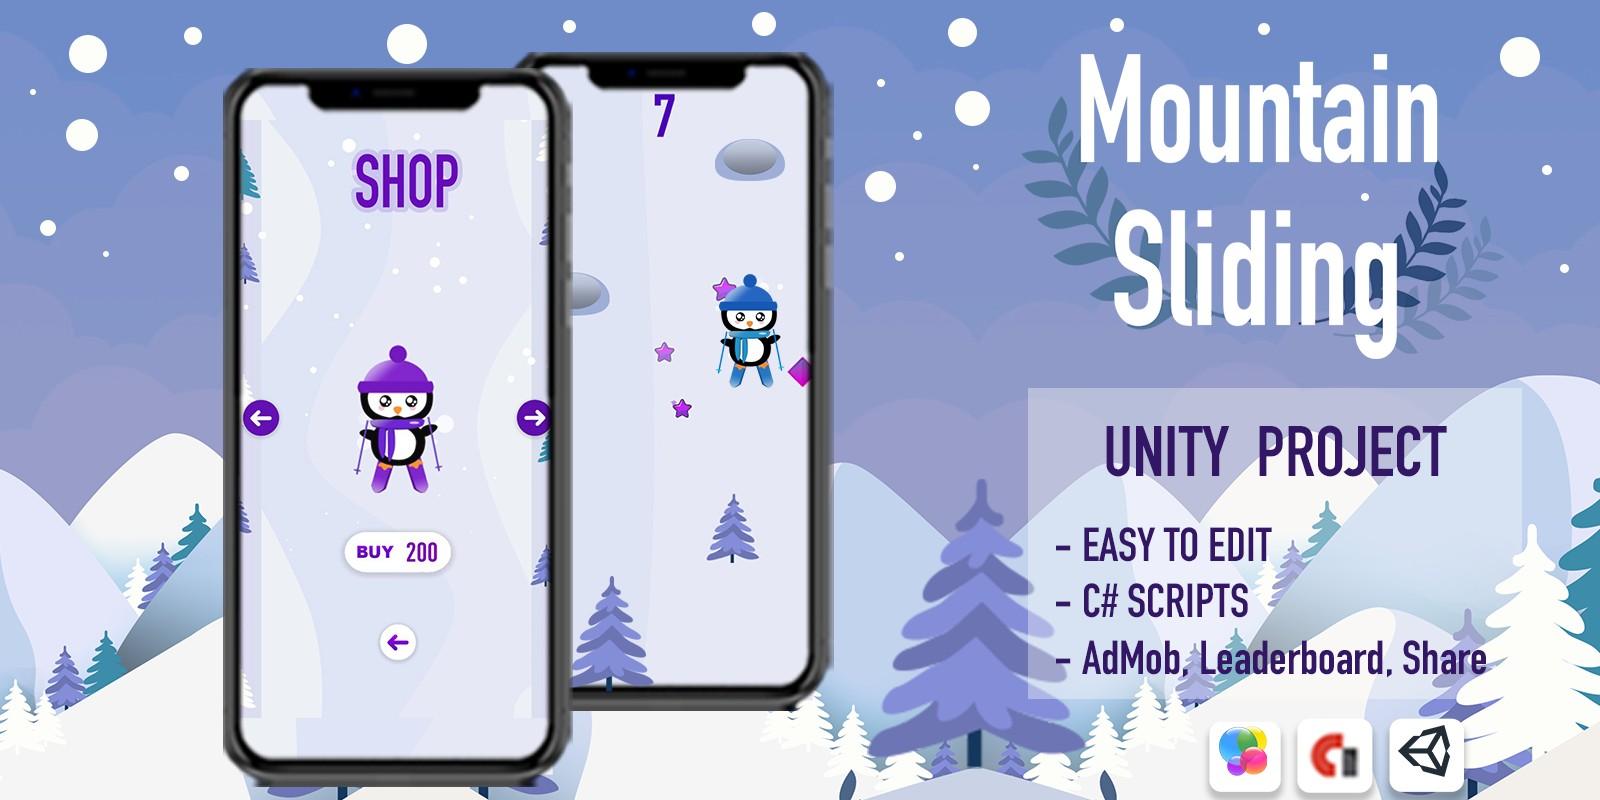 Mountain Sliding - iOS Template